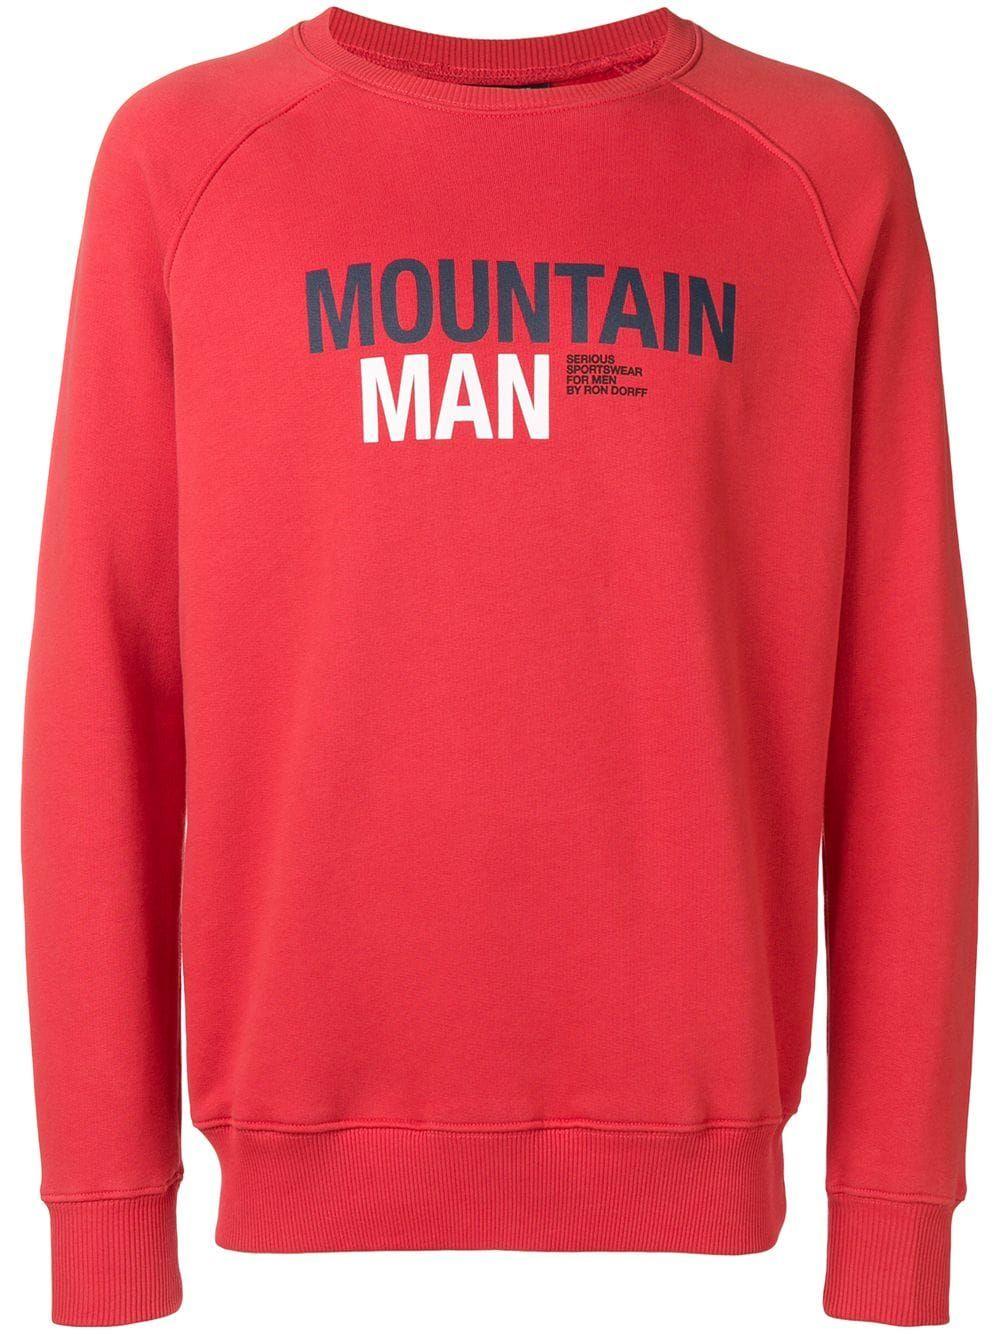 4ddaca0d228 RON DORFF RON DORFF MOUNTAIN MAN SWEATSHIRT - RED.  rondorff  cloth  Mountain Man